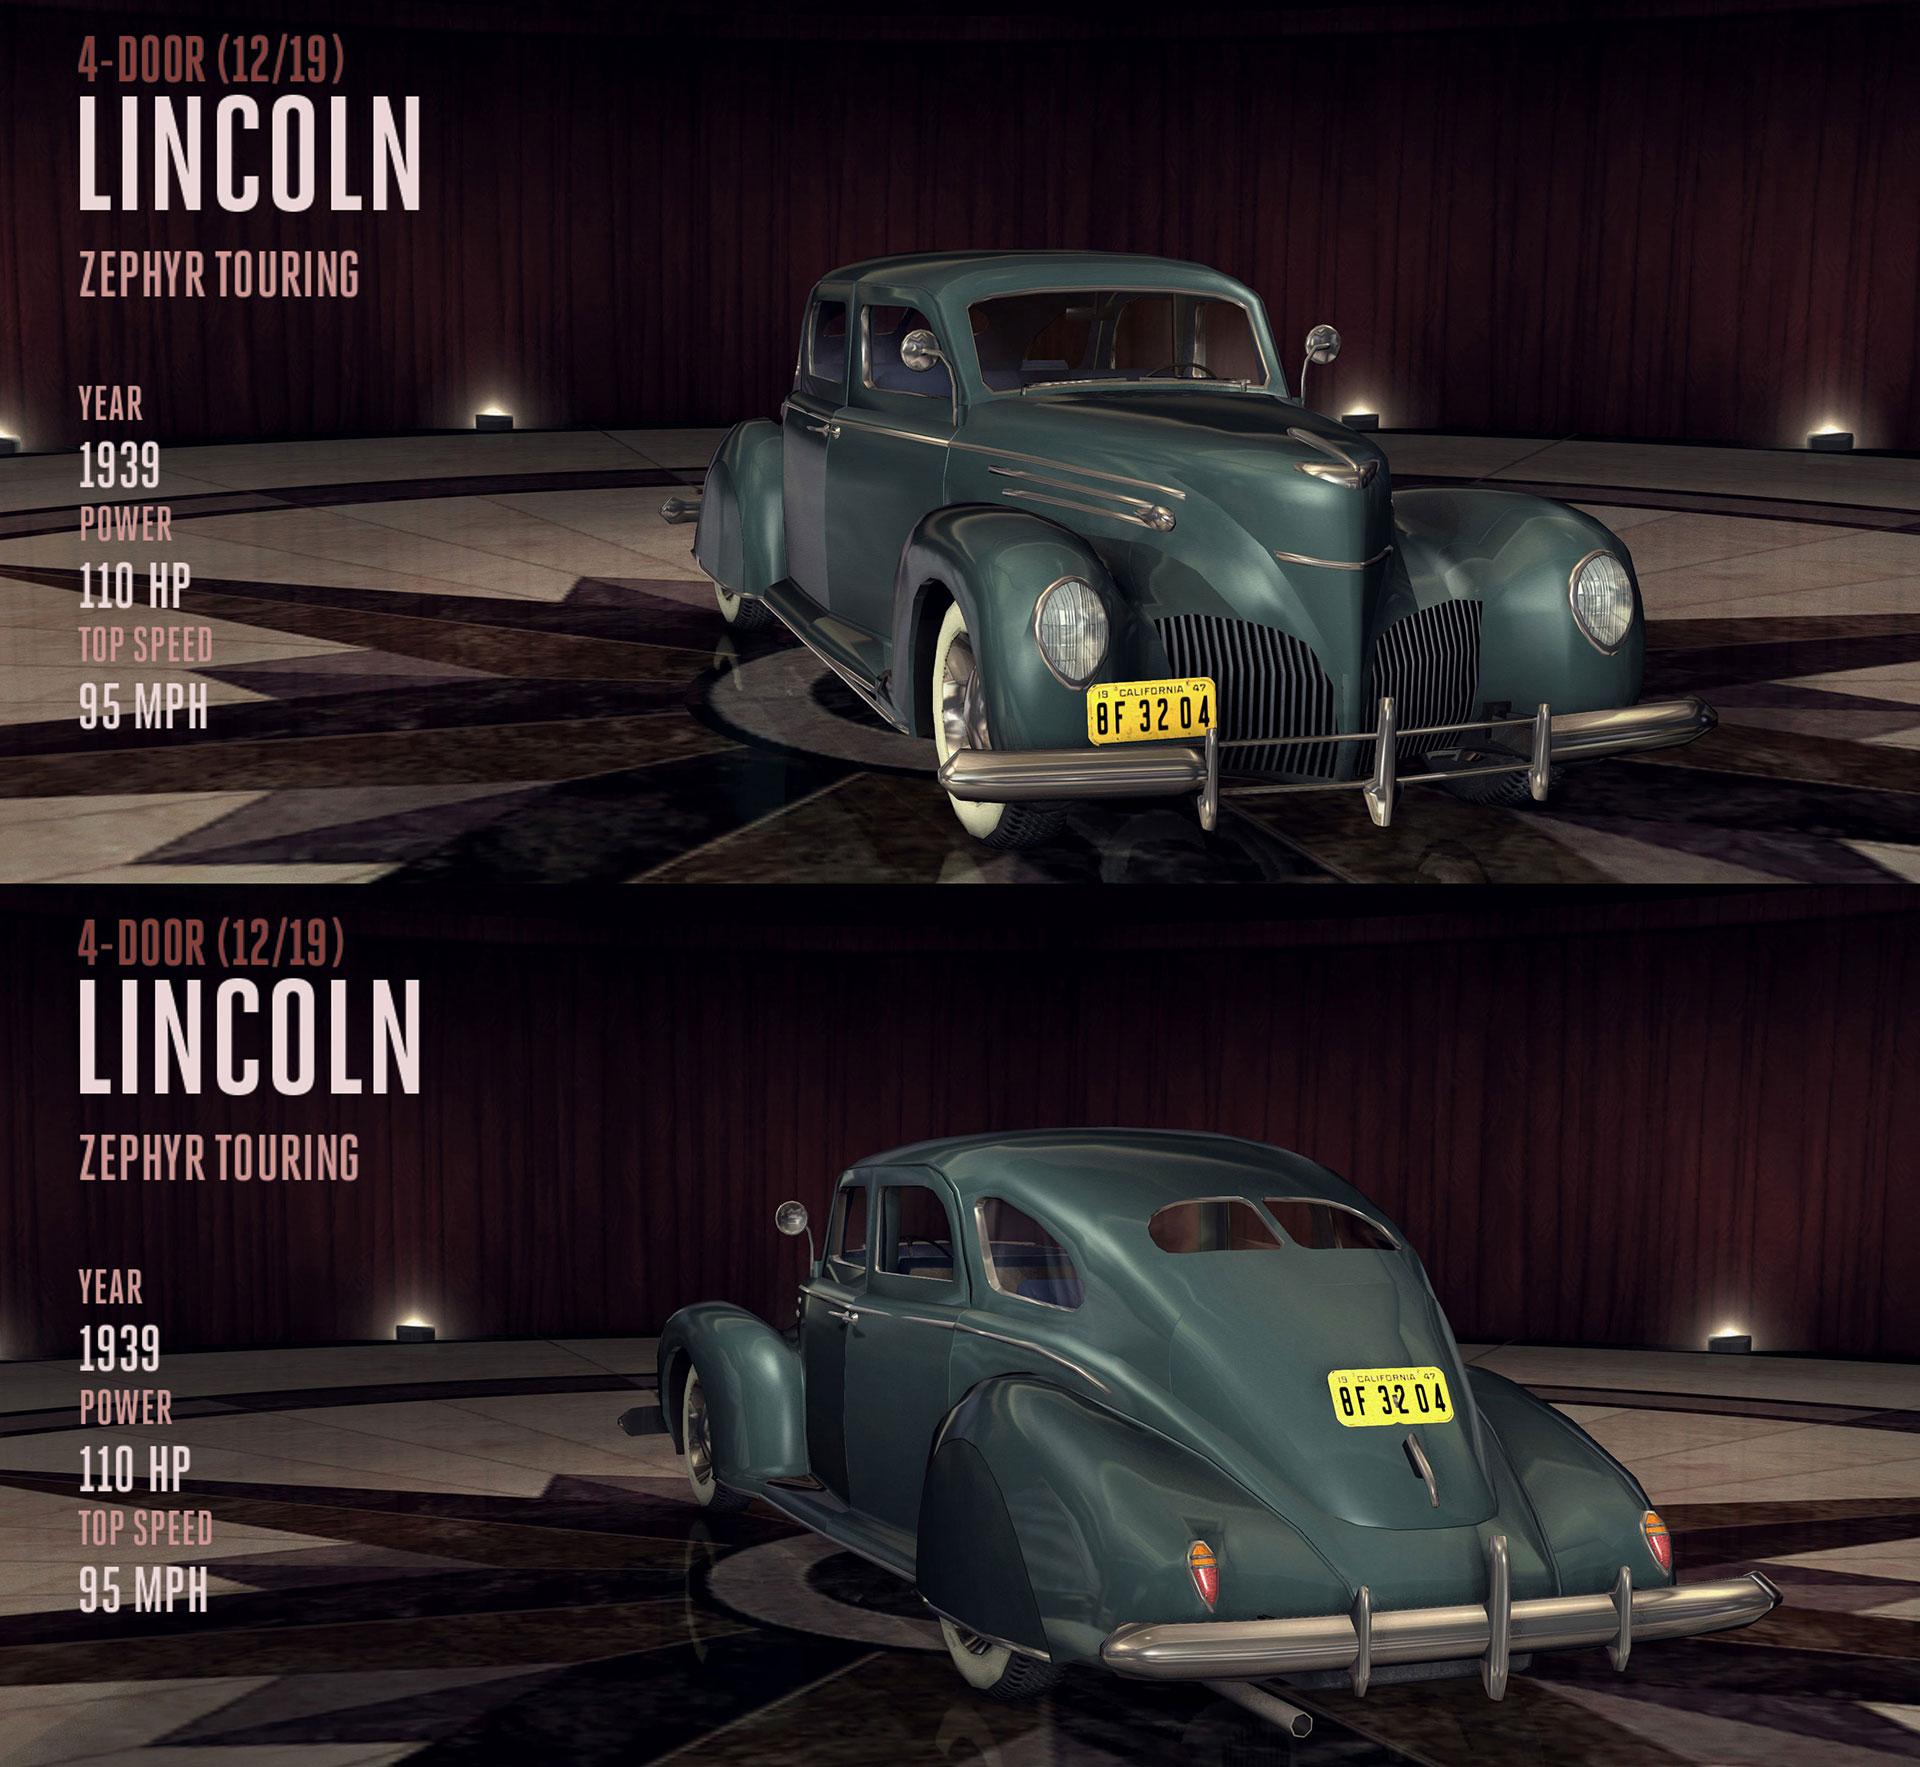 Archivo:1939-lincoln-zephyr-touring.jpg